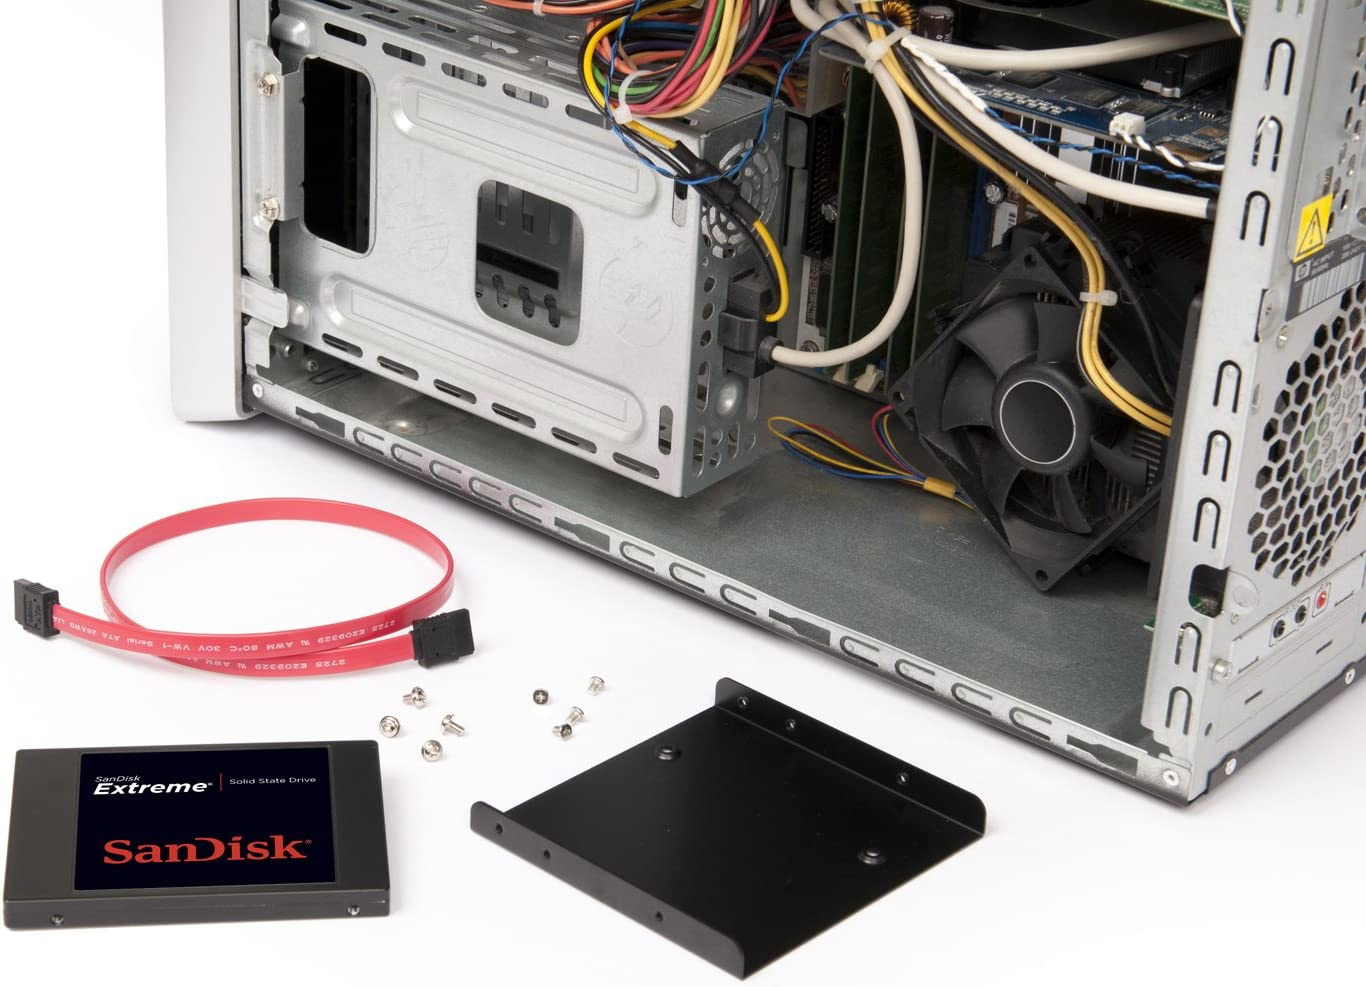 SanDisk SDSSDCK-AAA-G27 SSD Conversion Kit: Amazon.es: Informática